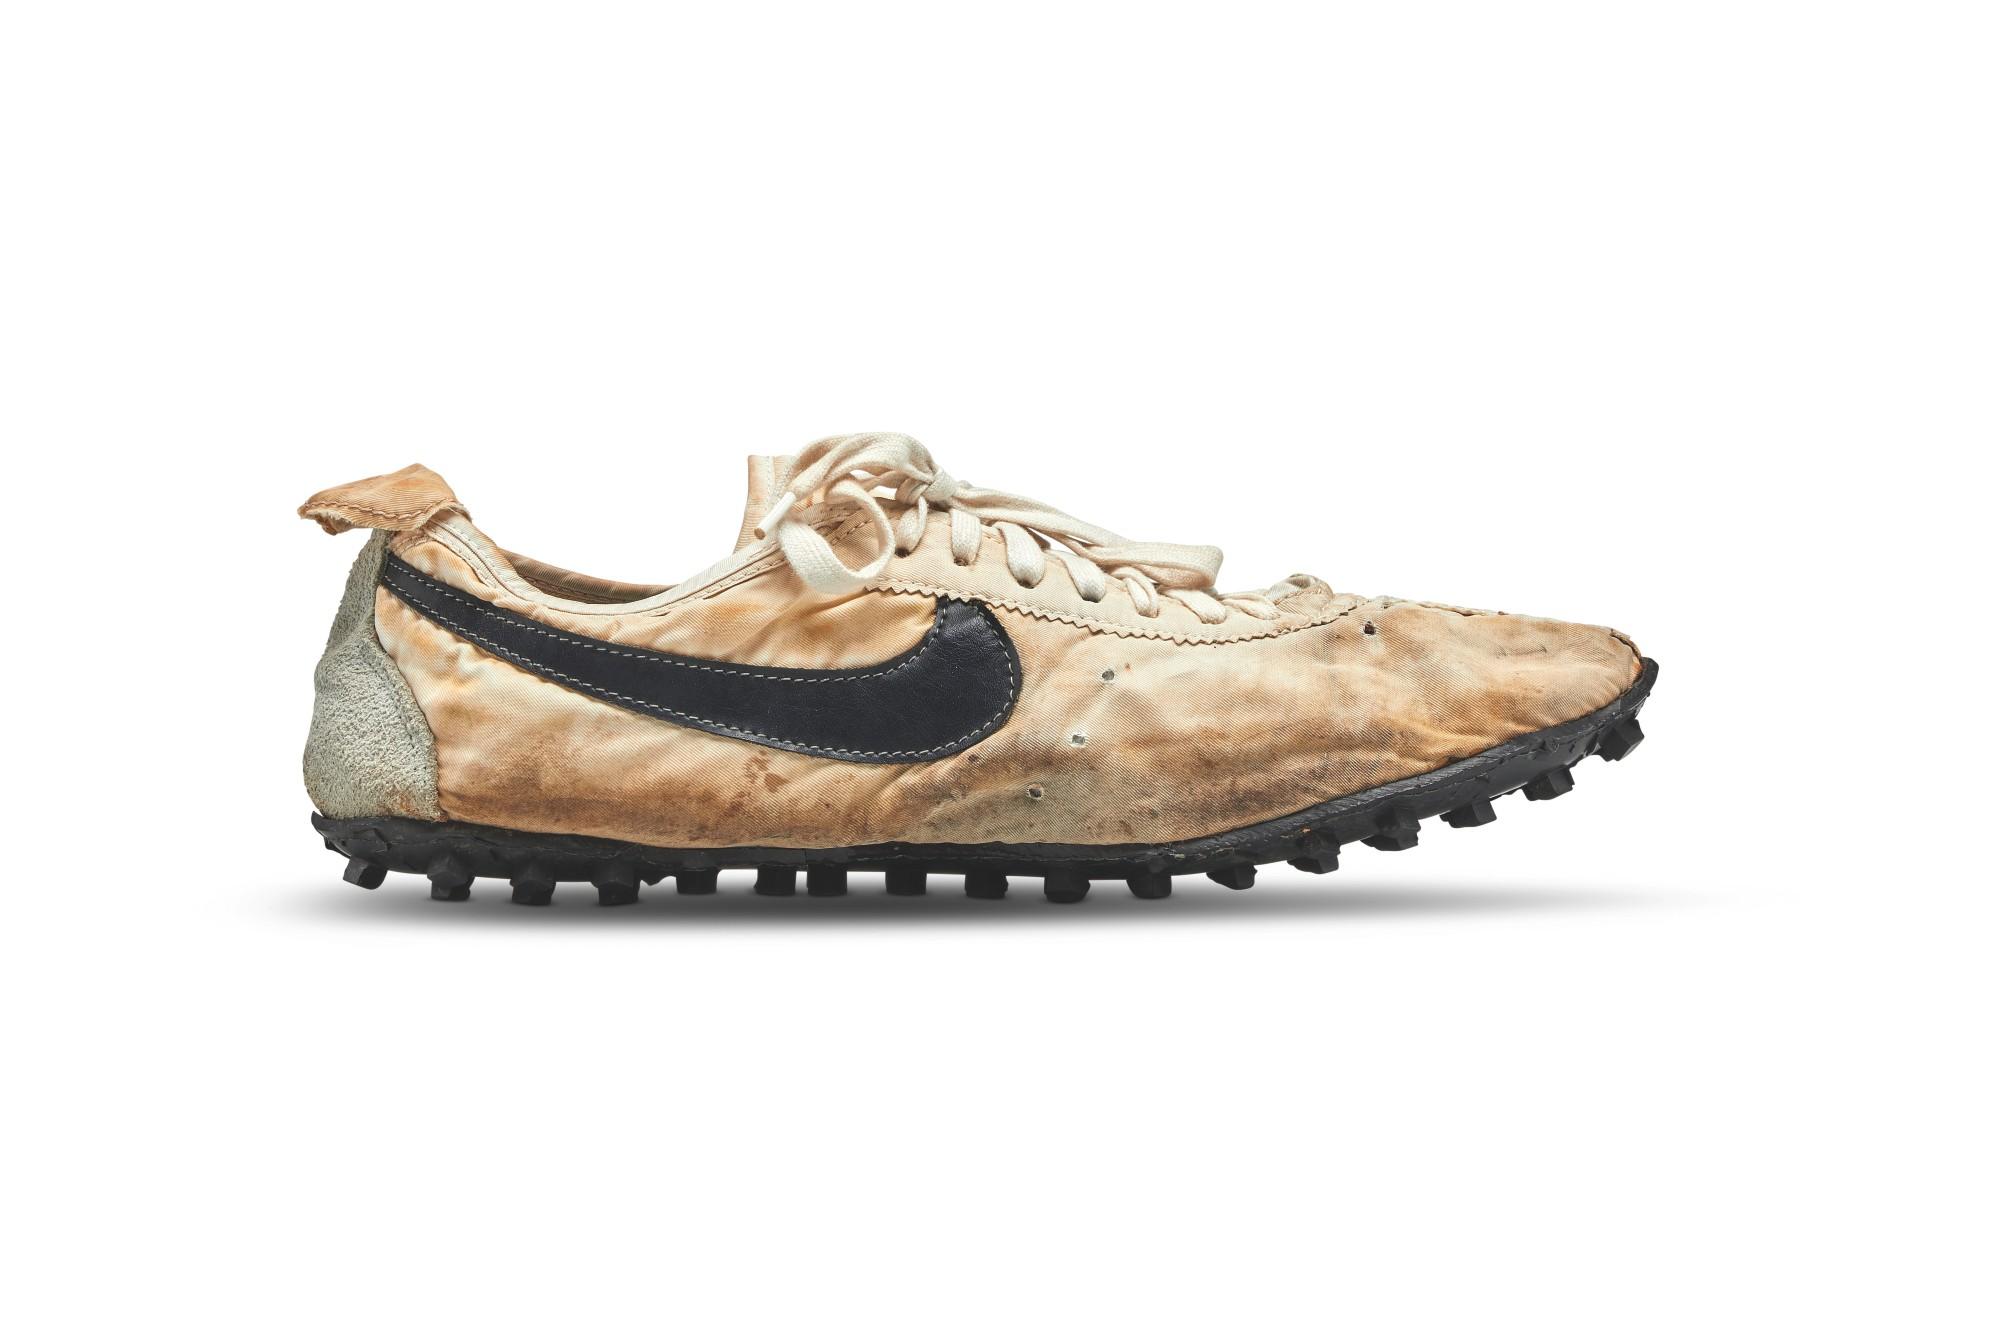 Nike 'Moon Shoe'